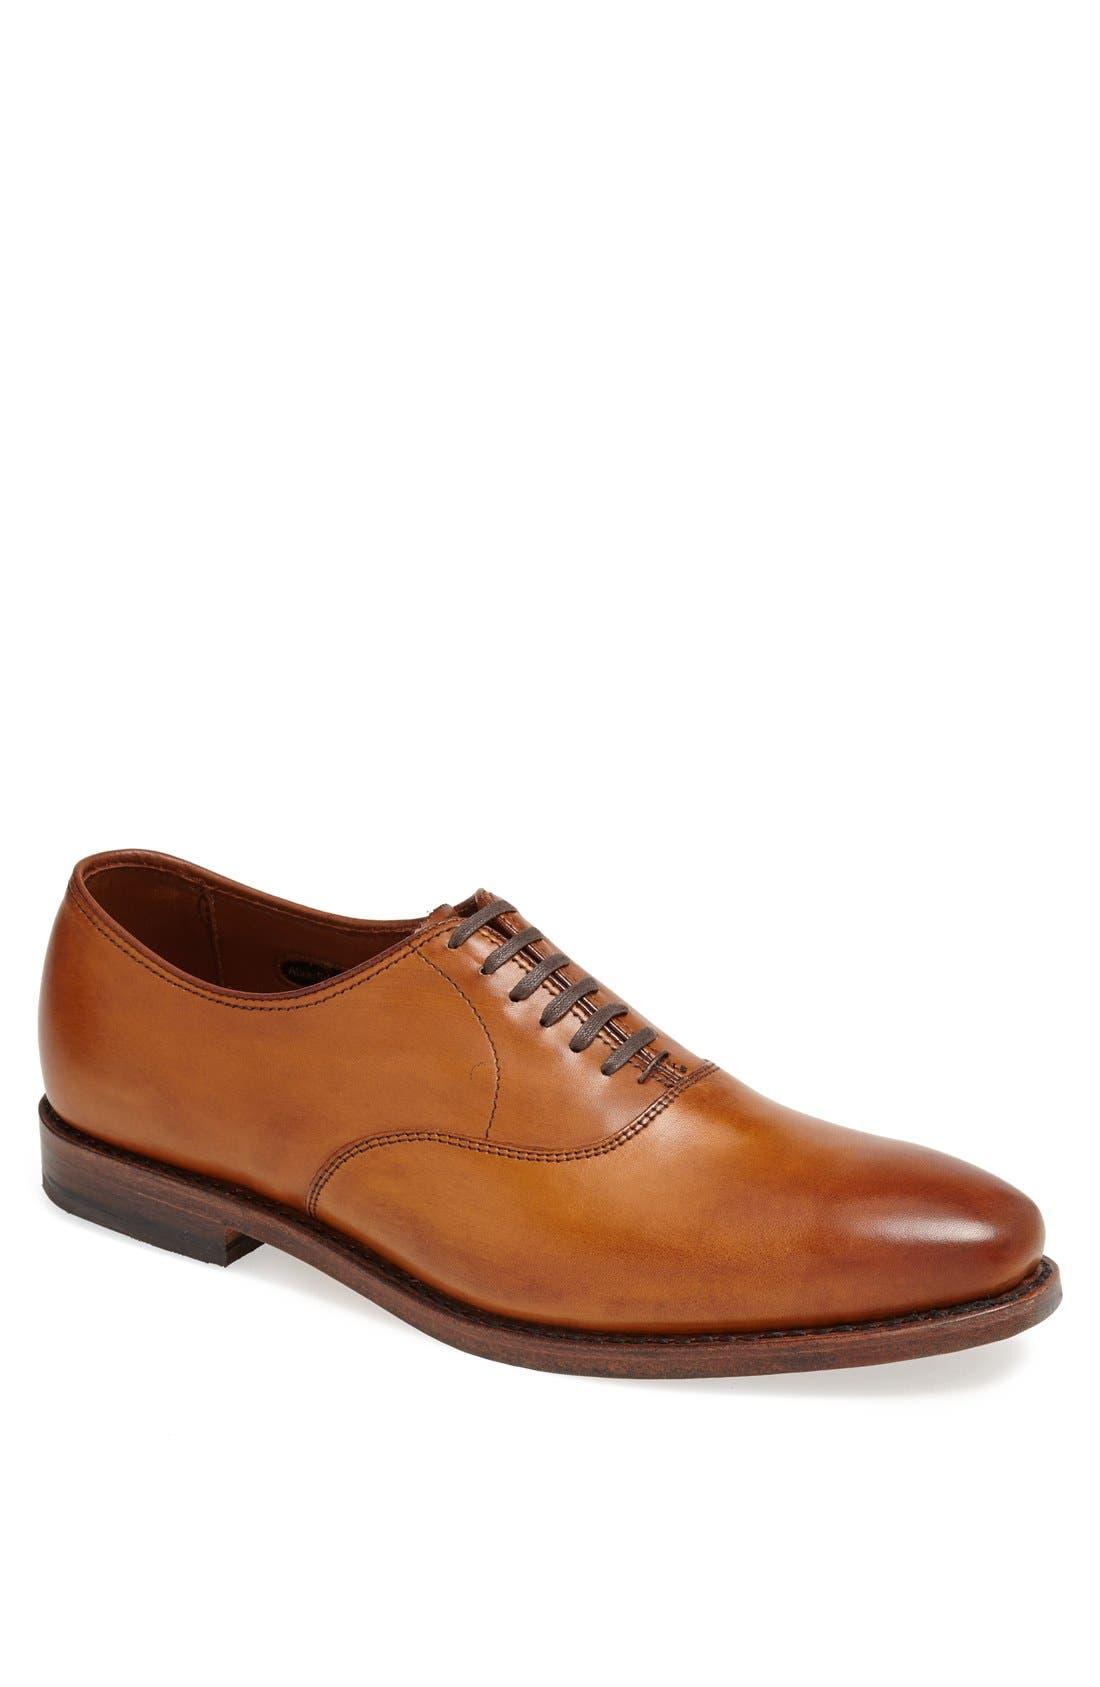 Carlyle Plain Toe Oxford, Main, color, WALNUT LEATHER